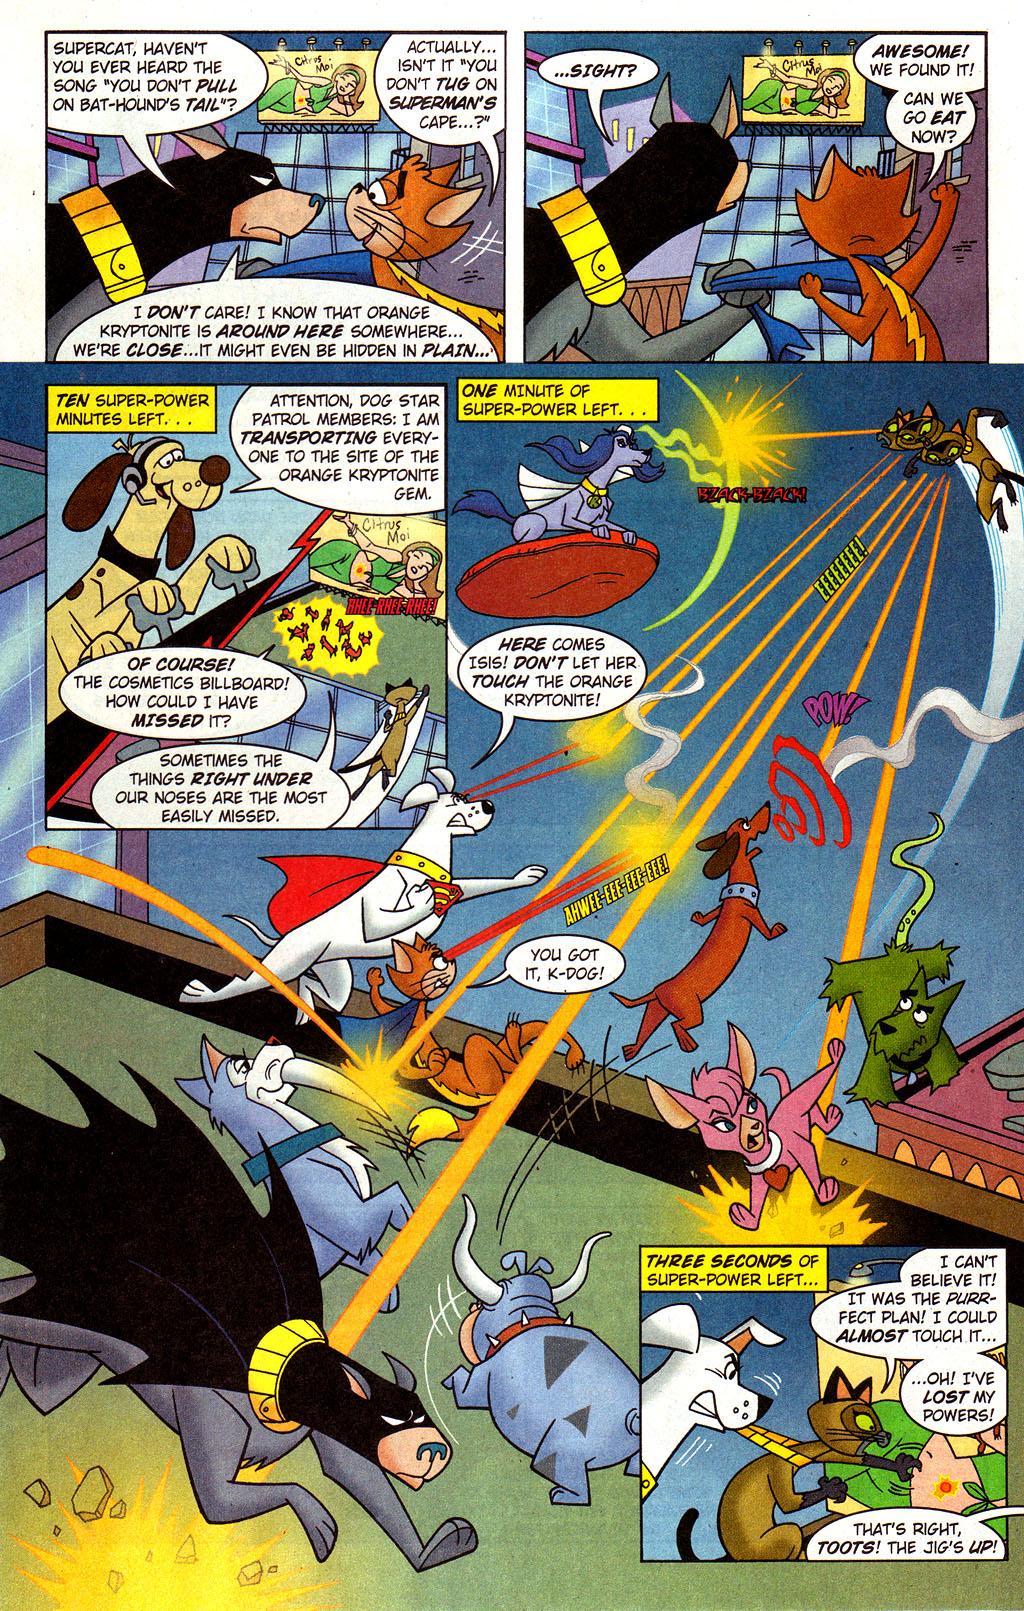 Read online Krypto the Superdog comic -  Issue #4 - 9